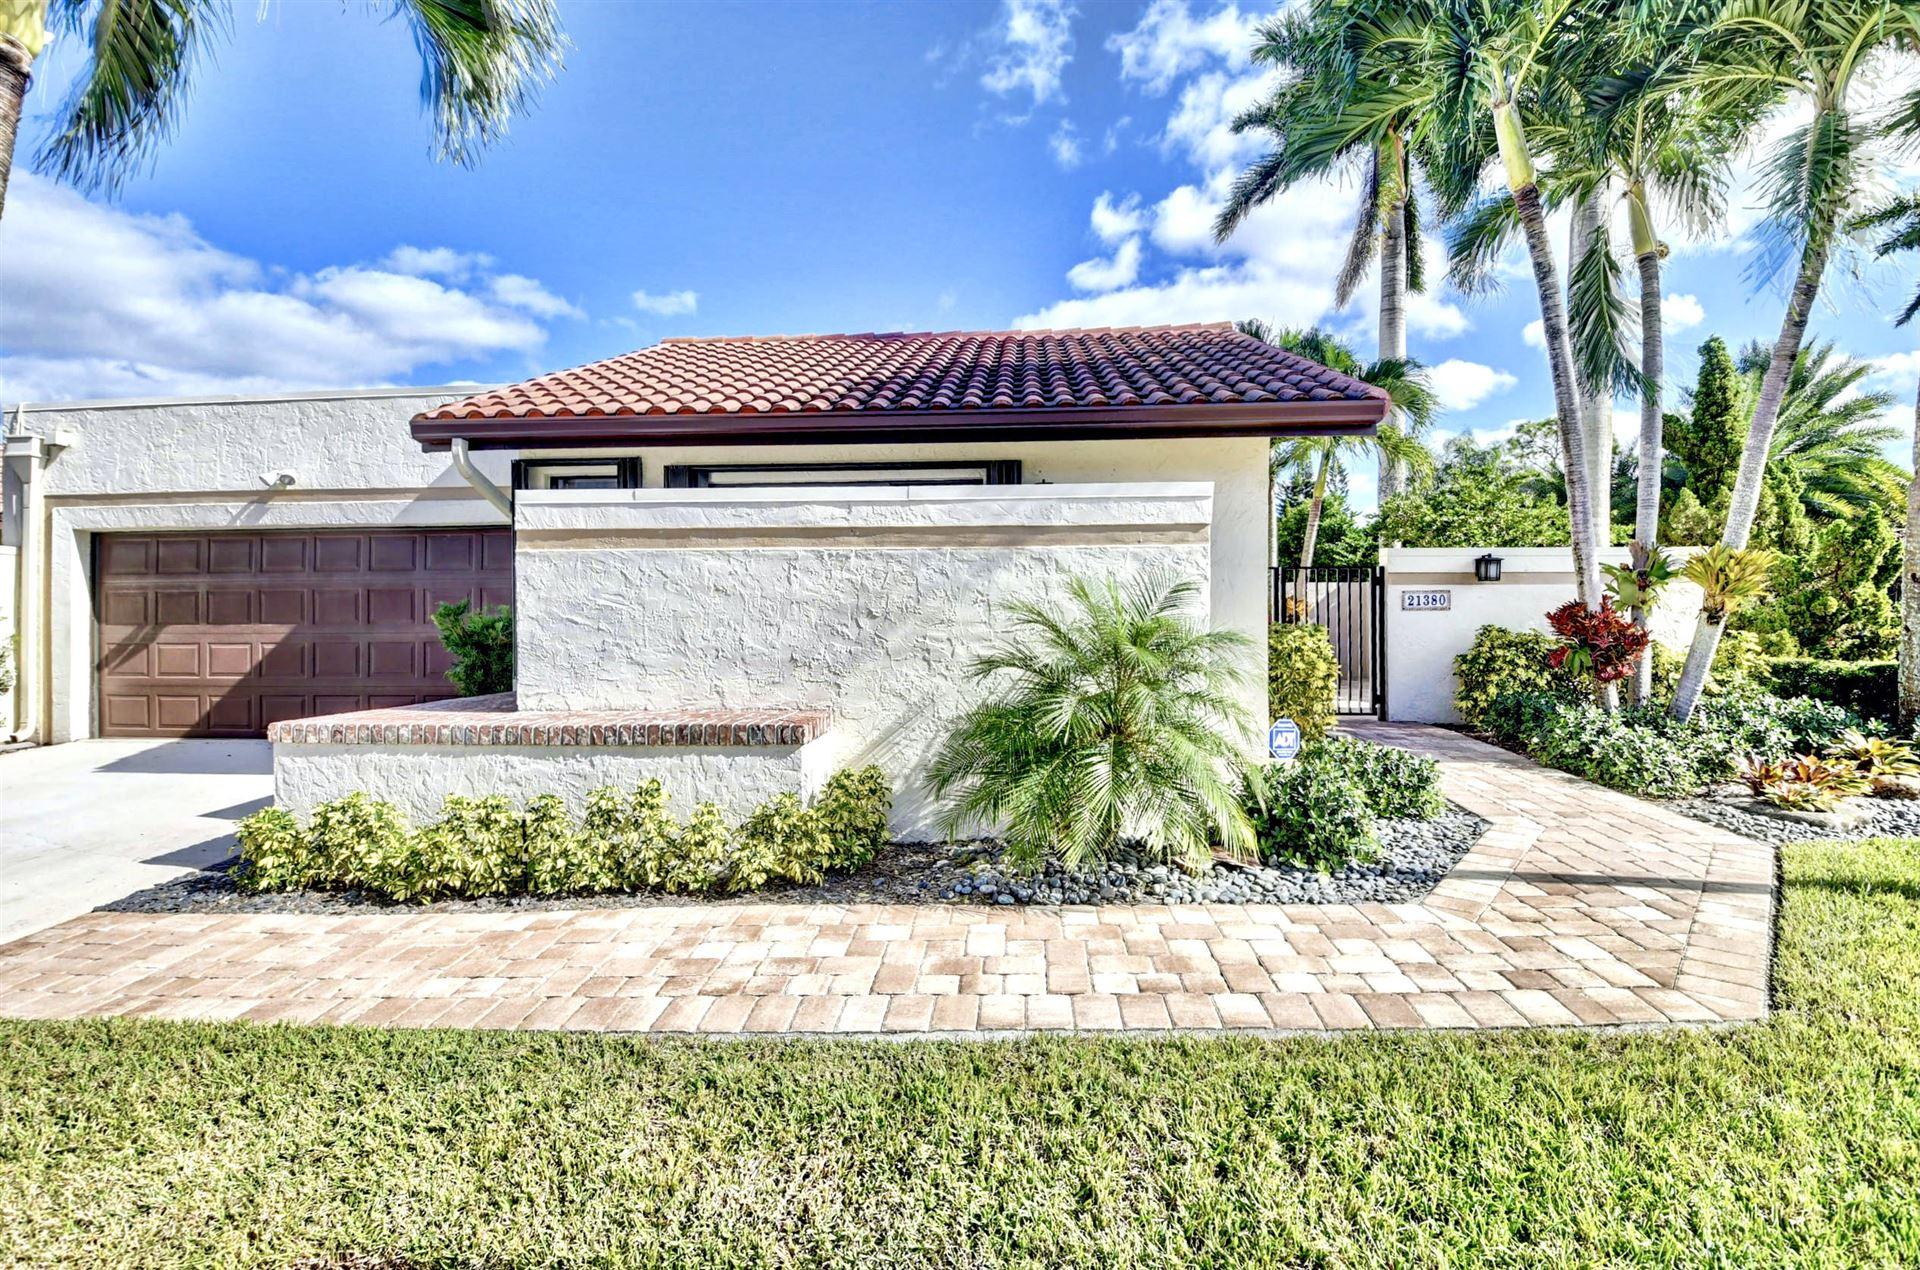 21380 Sonesta Way, Boca Raton, FL 33433 - #: RX-10676091